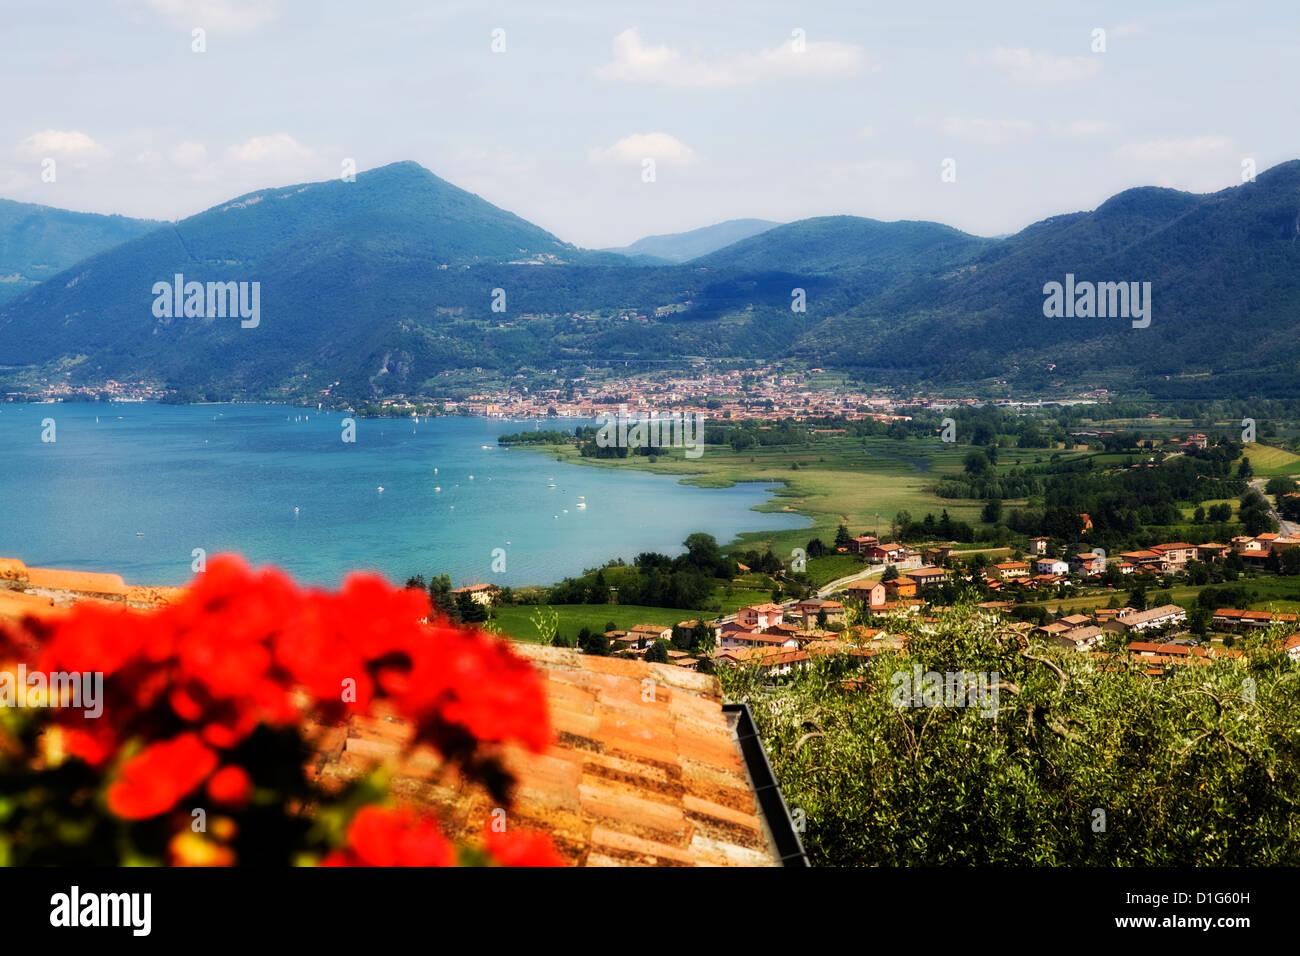 Lago d'Iseo, Brescia/Bergamo, Italy - Stock Image